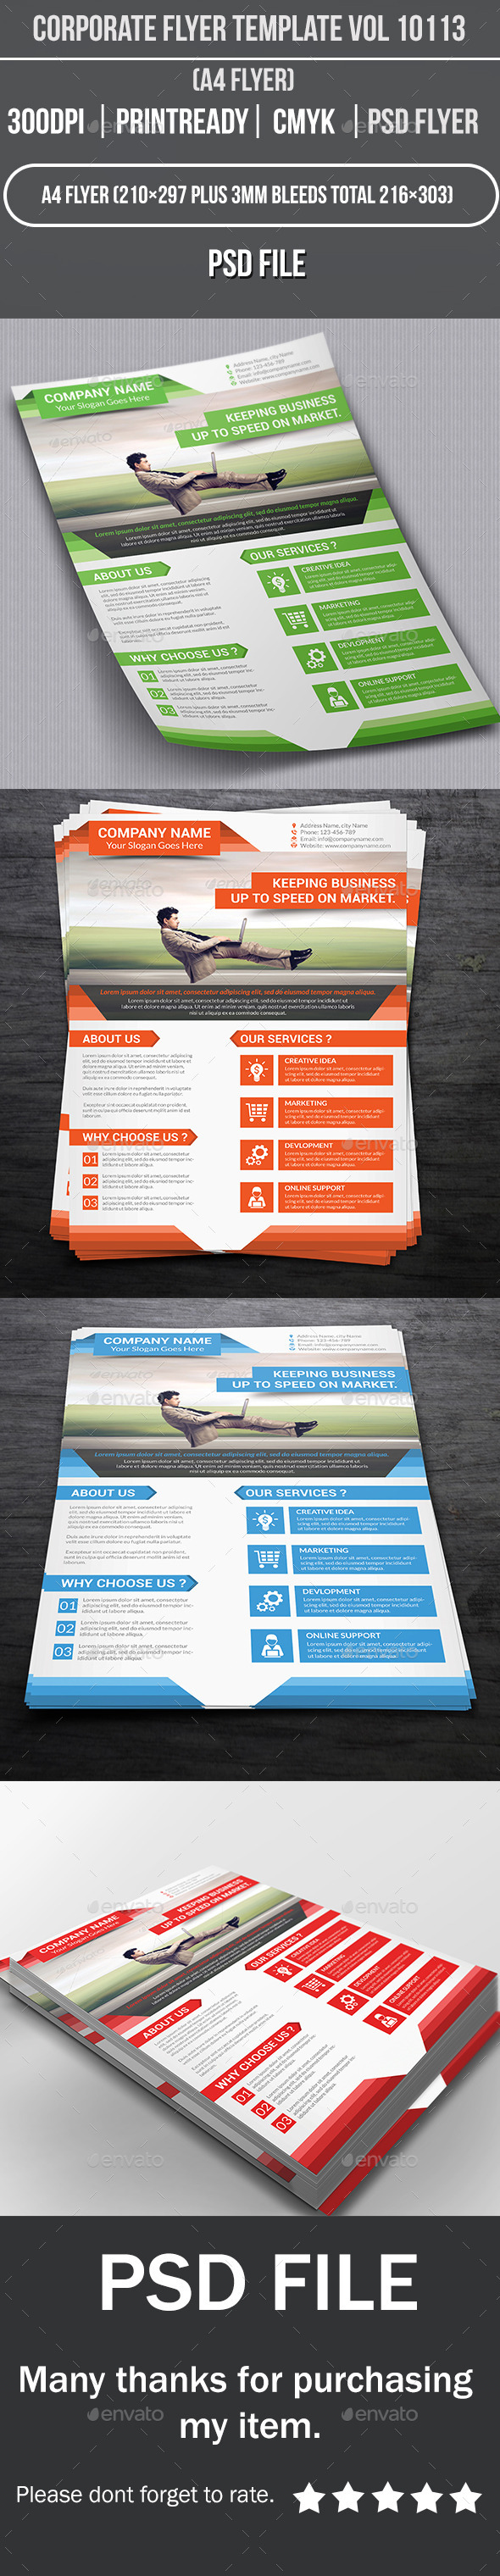 Corporate Flyer Template Vol 10113 - Corporate Flyers